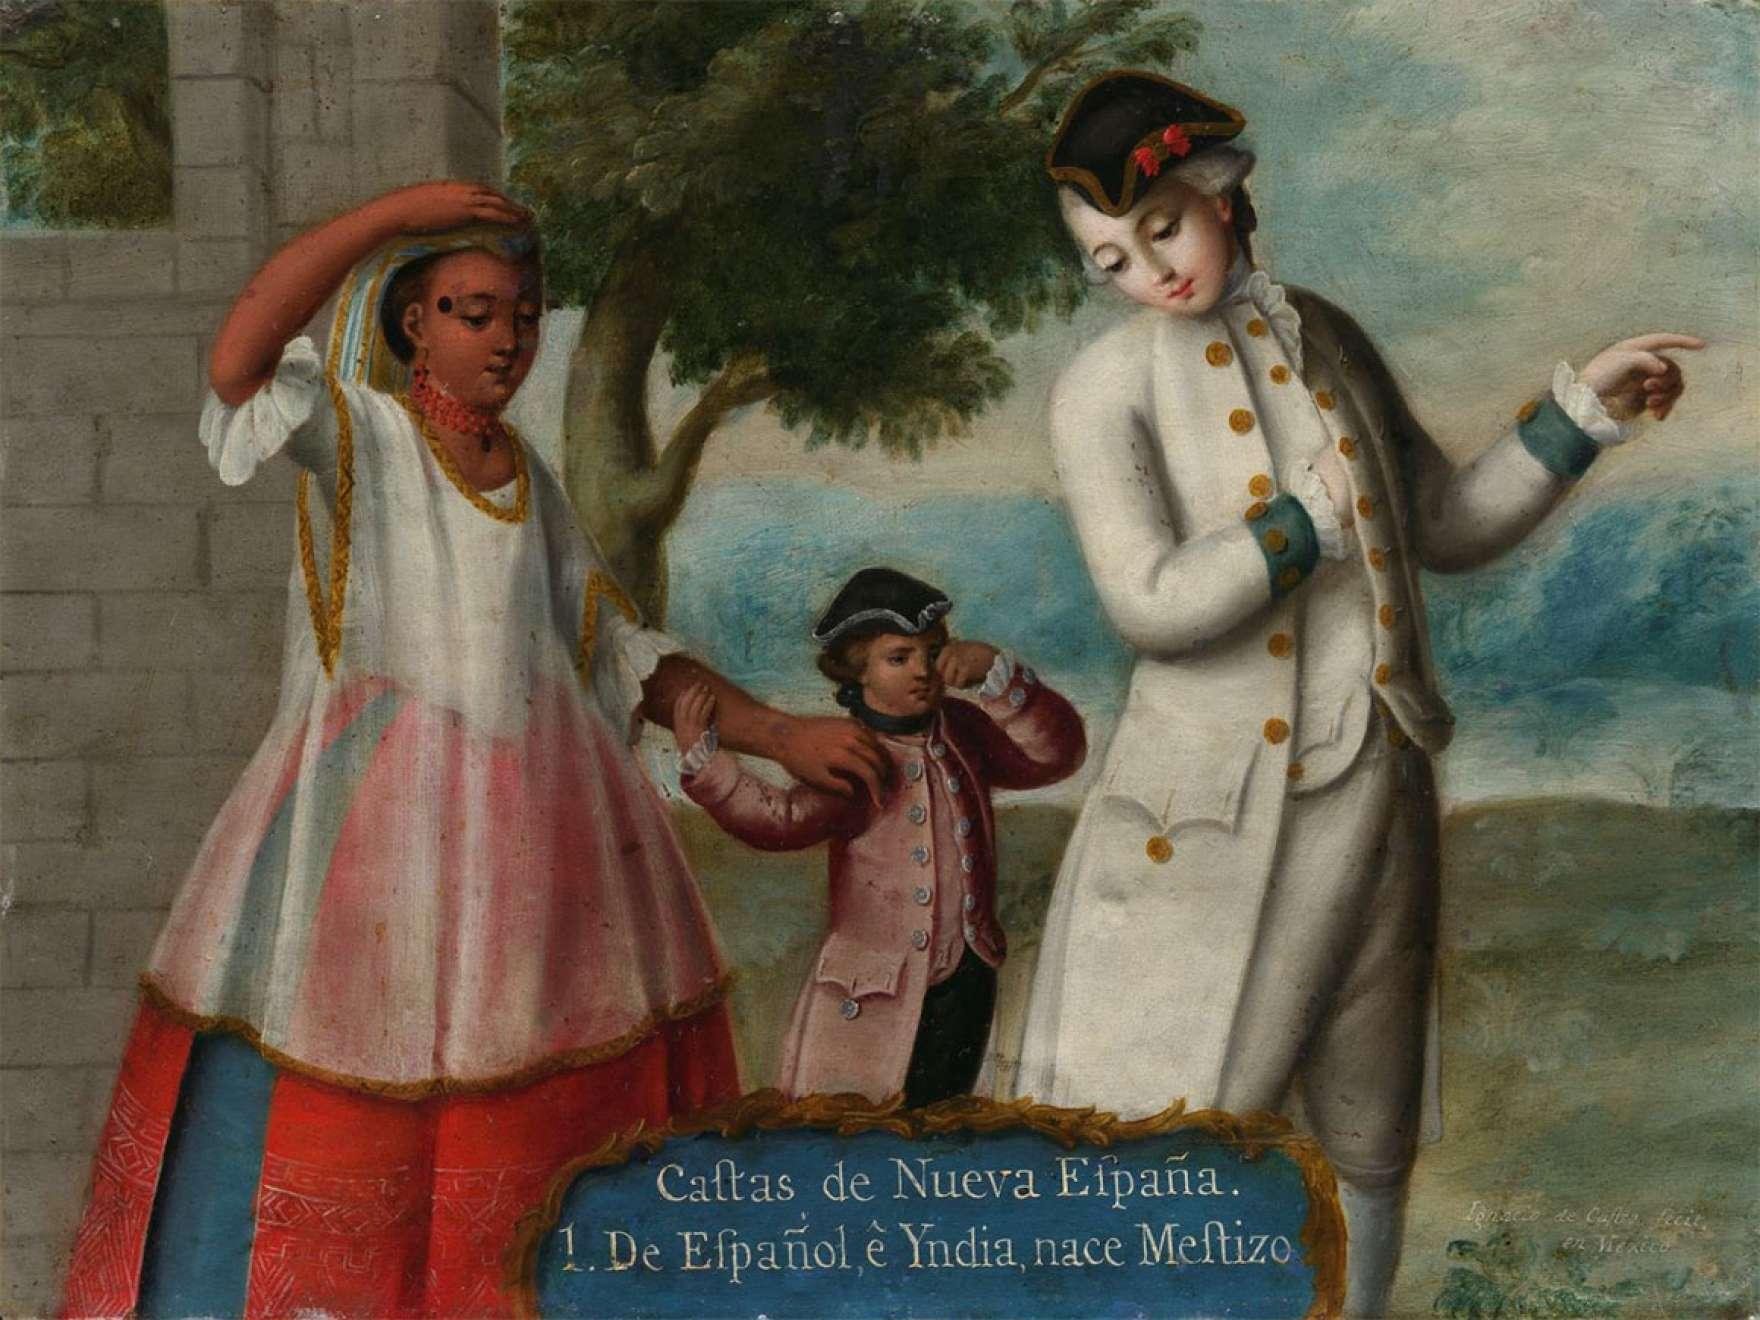 Ignacio de Castro's oil on copper painting, Castas de Nueva Espana (Castes of New Spain) / 1. De Espanol e Yndia, nace Mestizo (From Spaniard and Indian, a Mestizo is born), about 1775